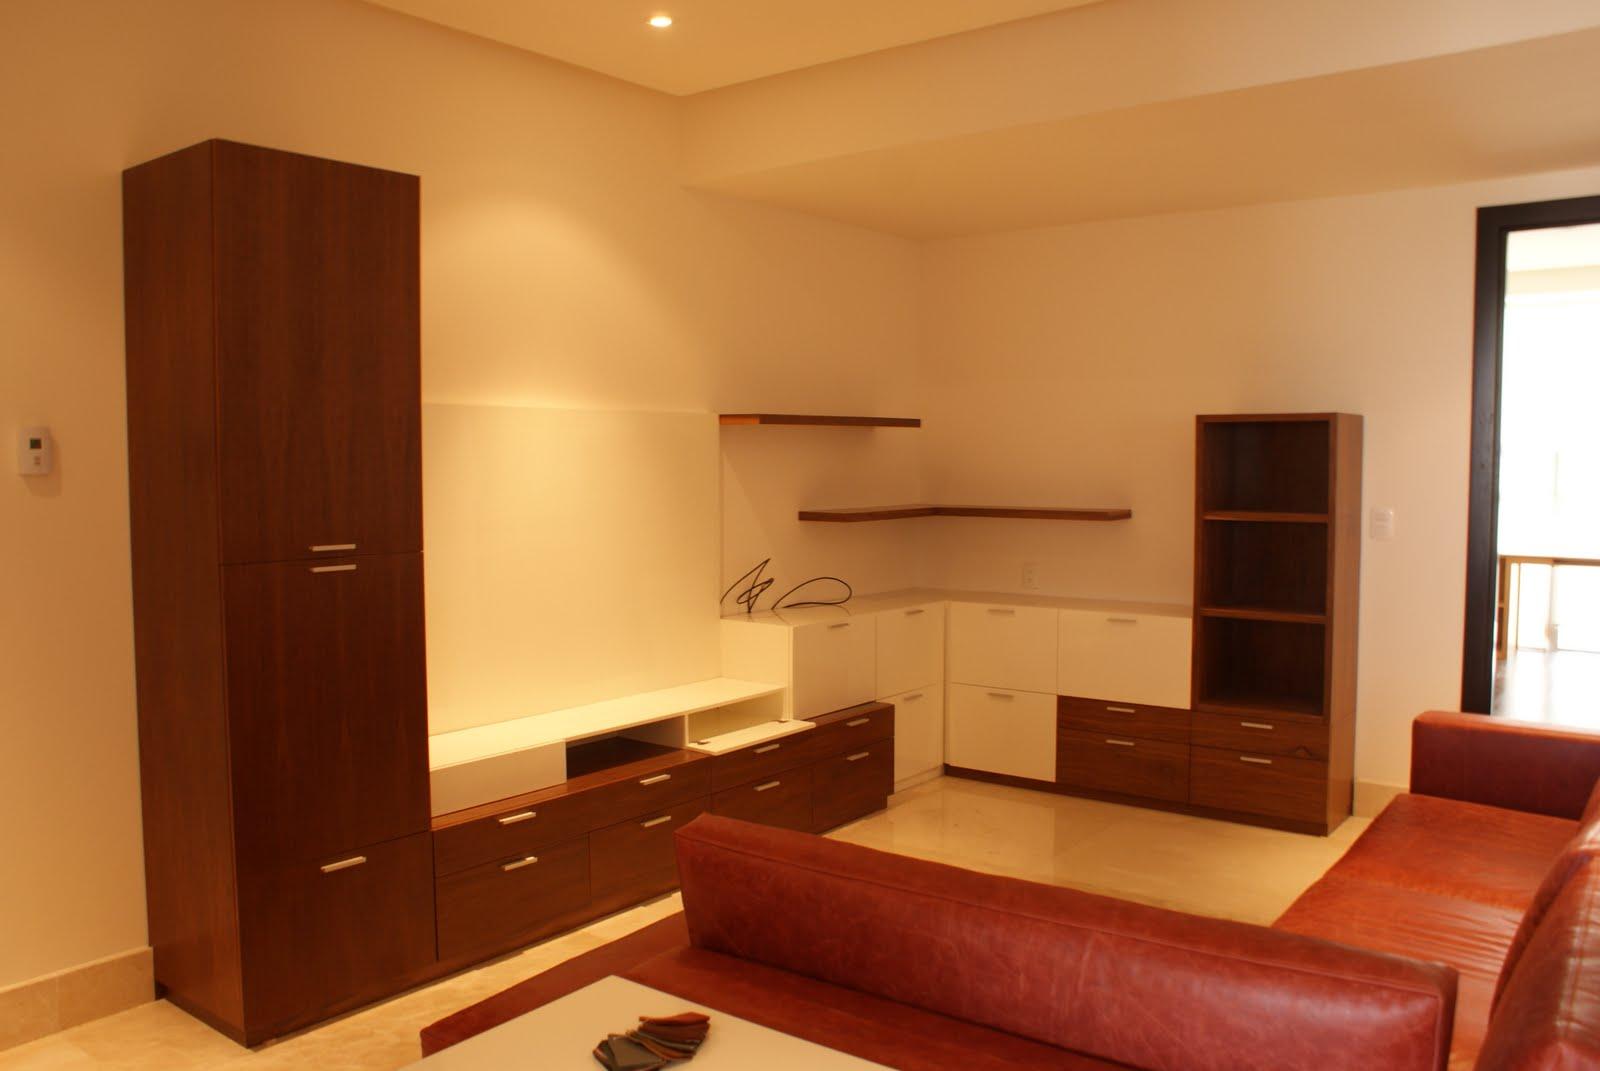 Diseo de muebles de sala amazing aqu tenemos un mueble tv for Muebles para sala de tv